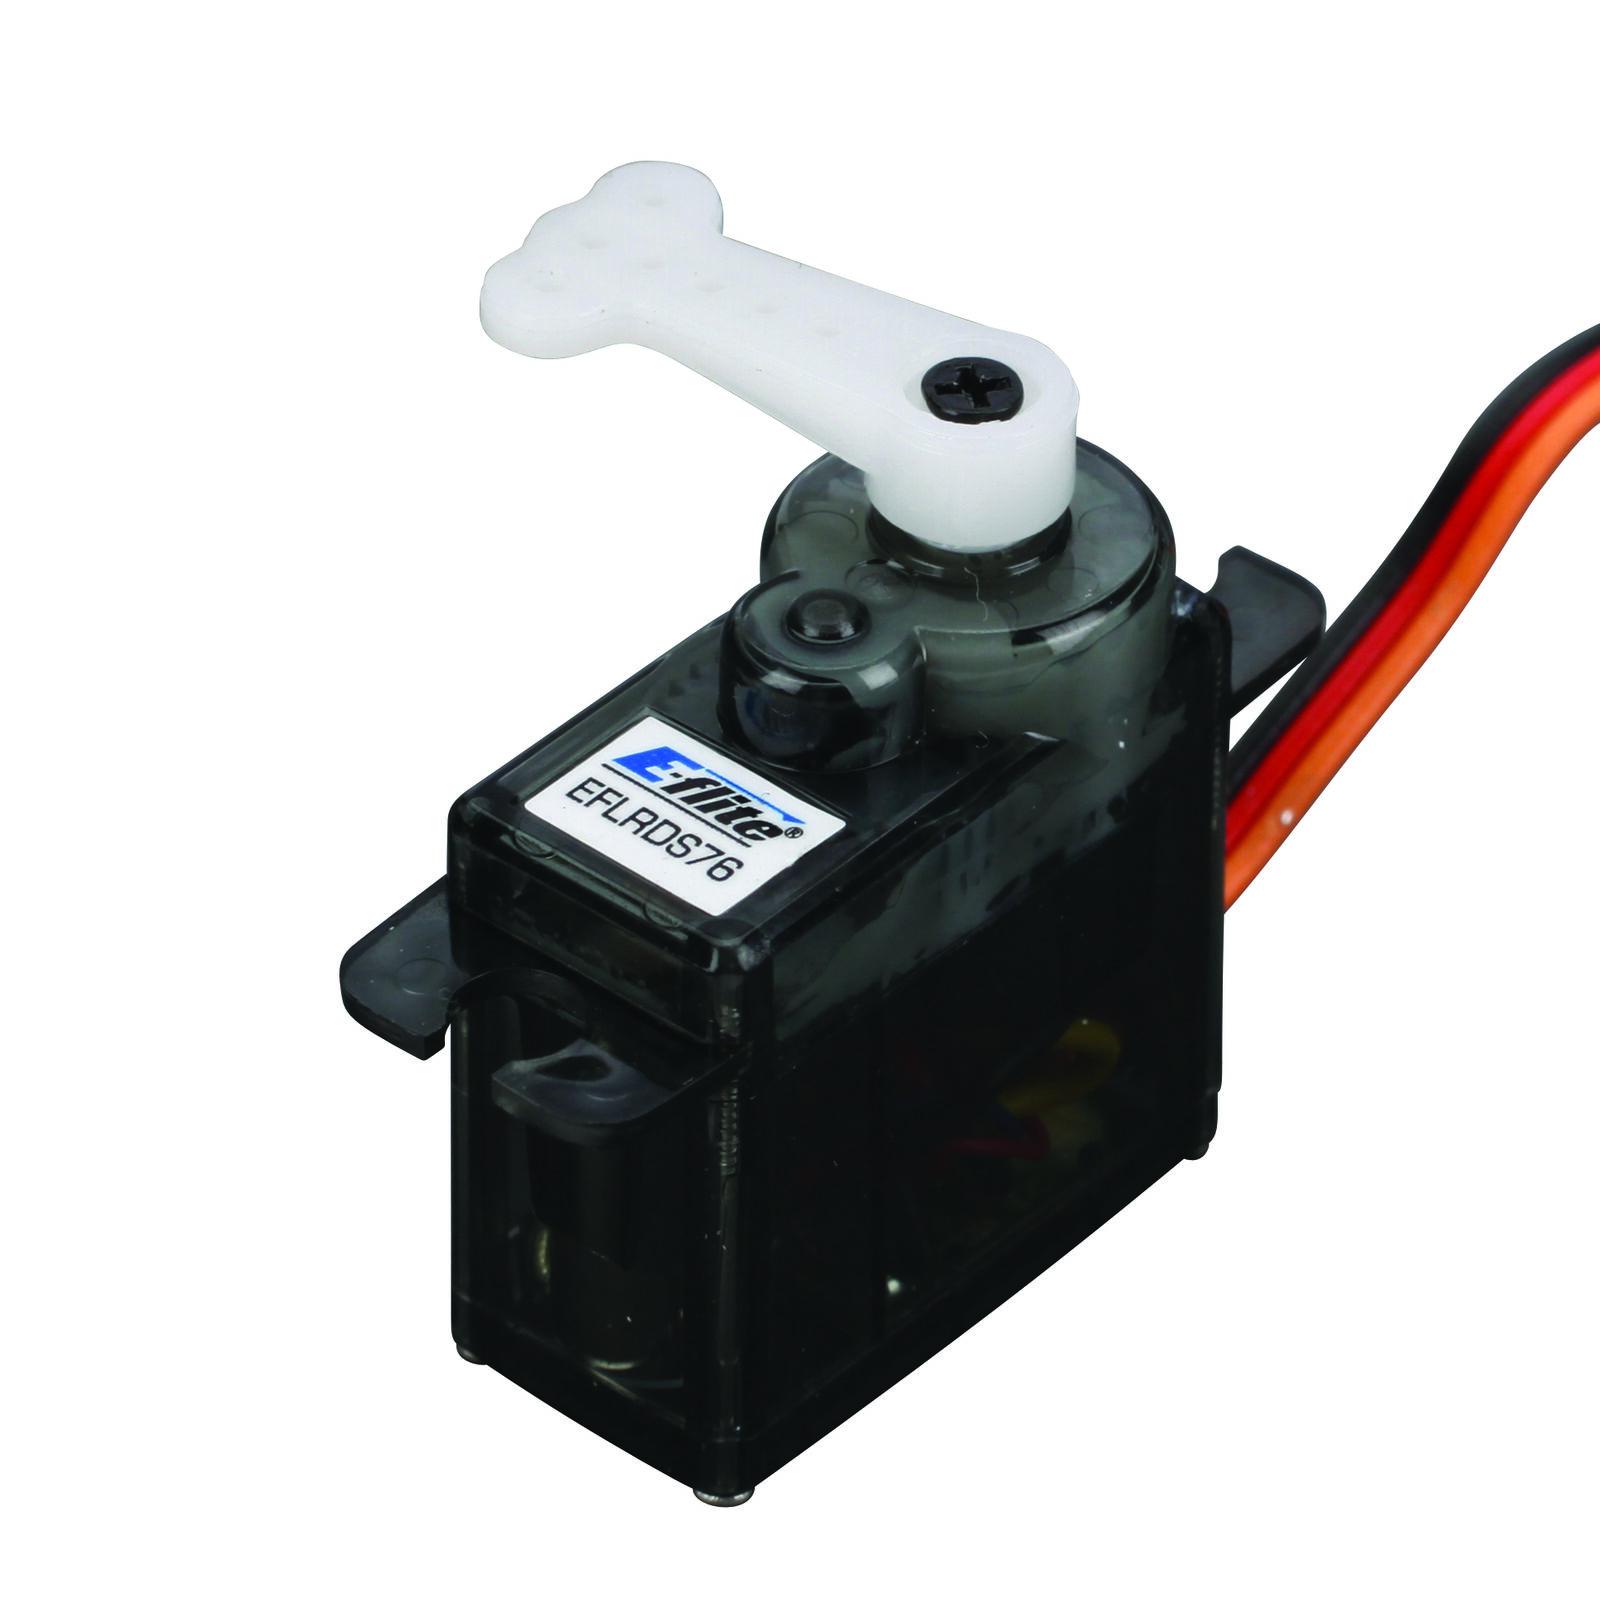 7.6-Gram DS76 Digital Sub-Micro Servo